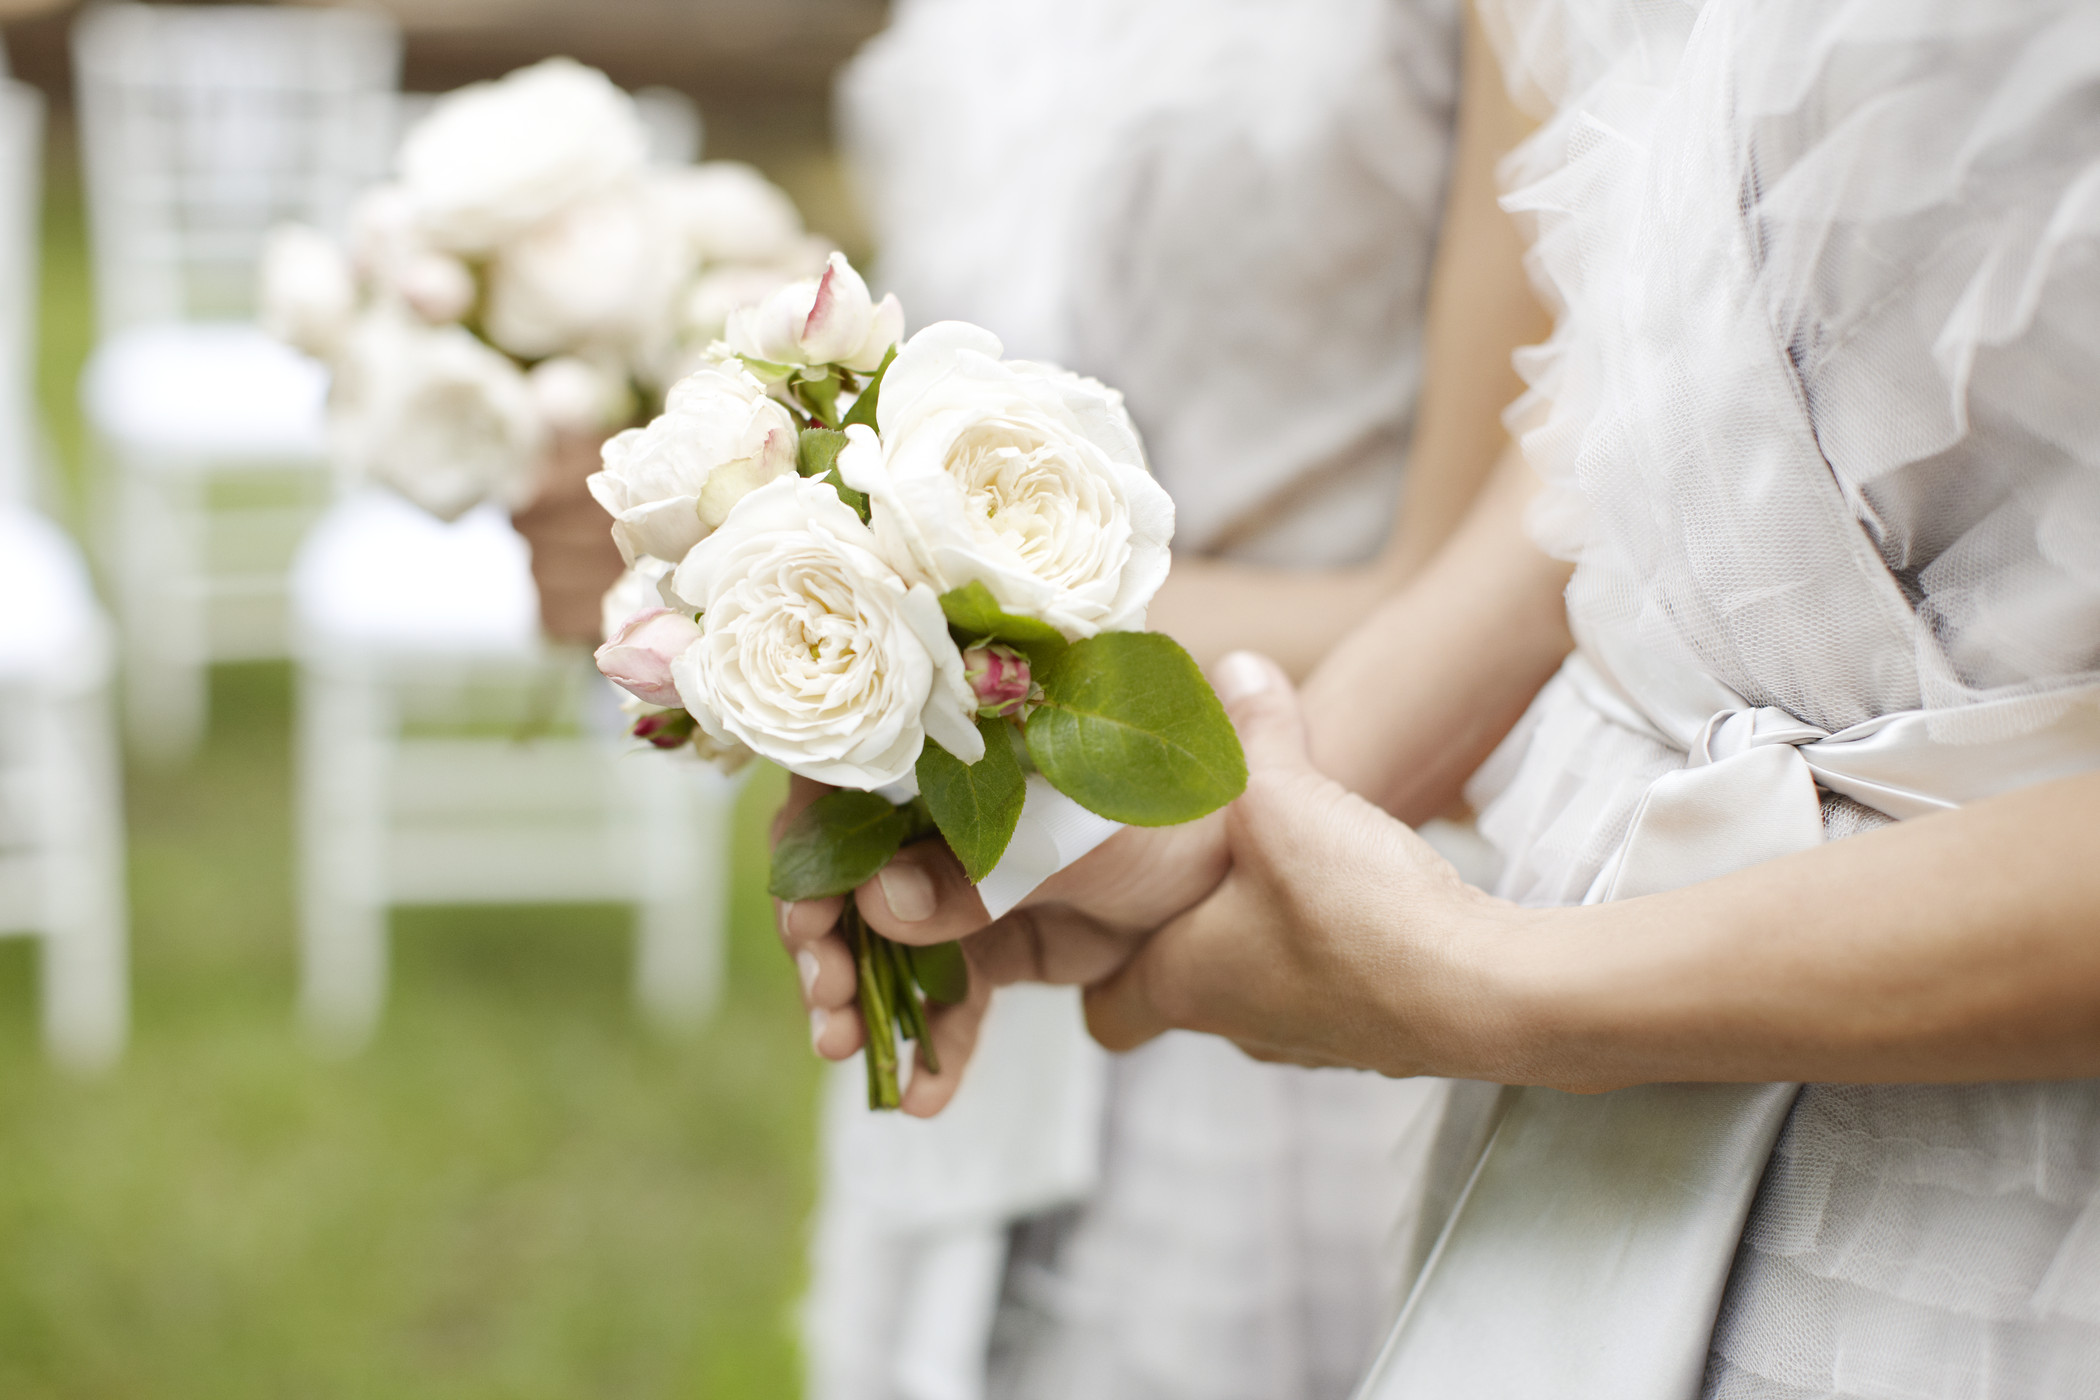 свадьба в Израиле традиции